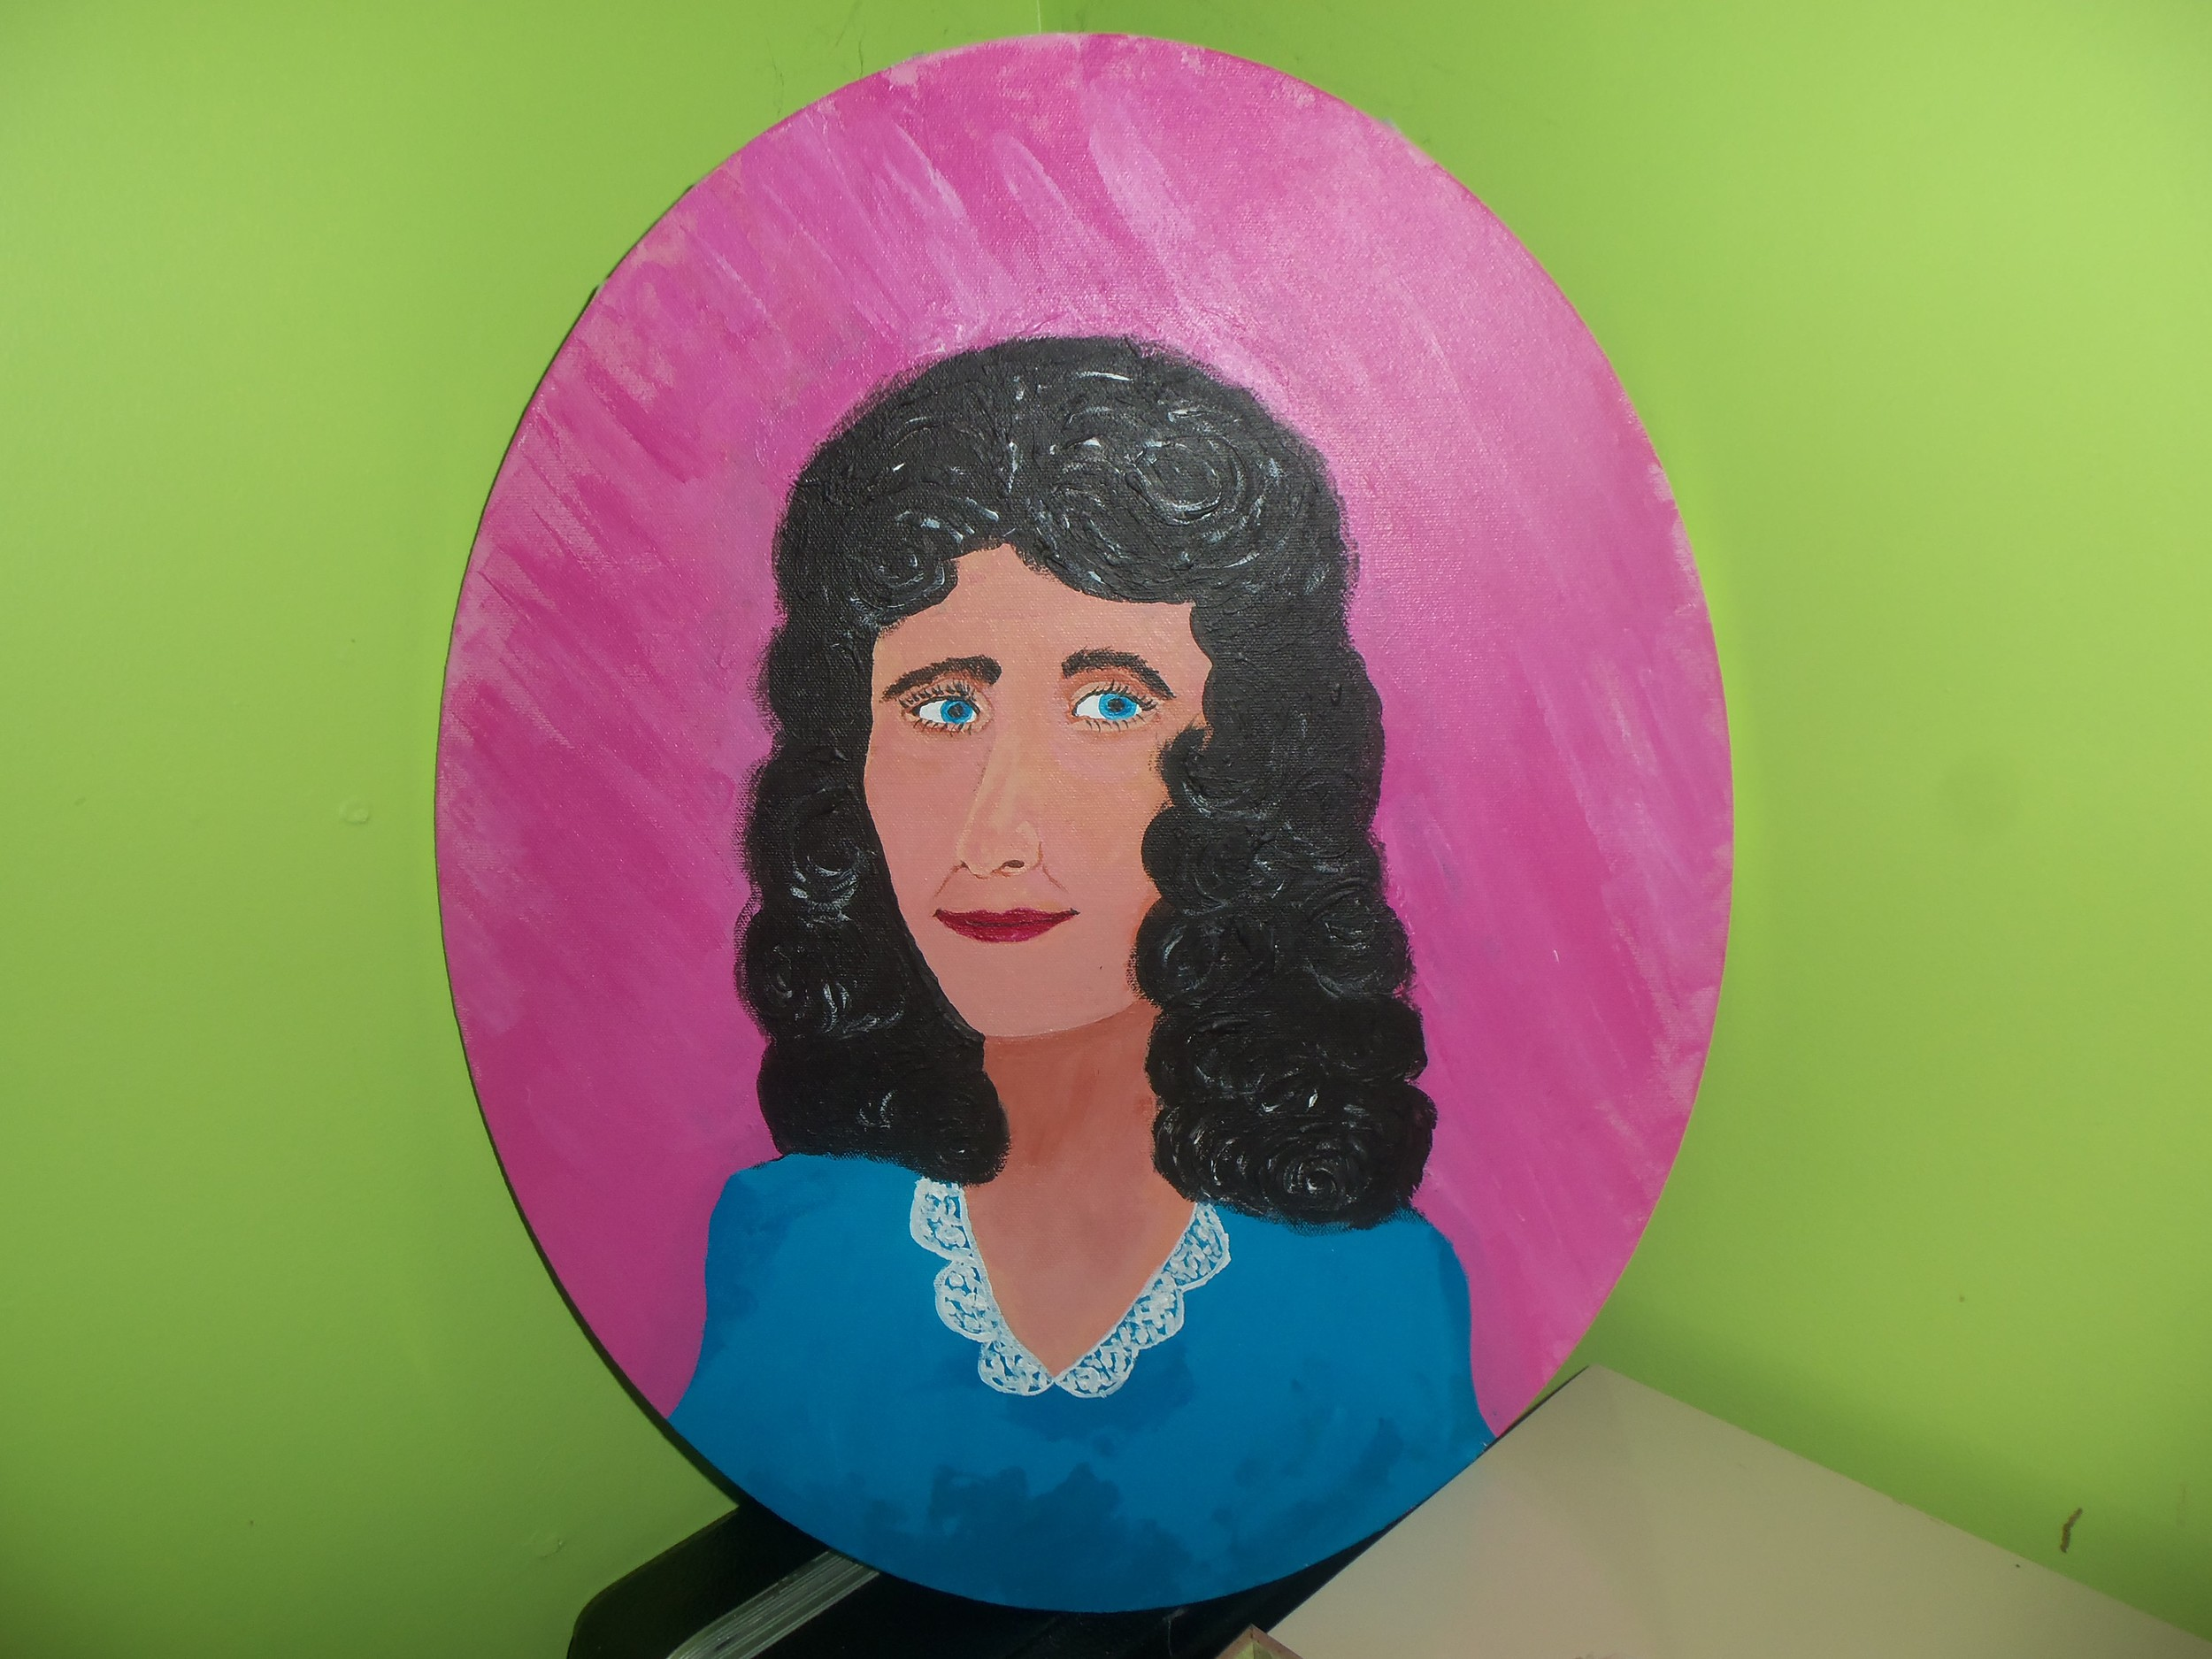 Fannie Brock from Red Bird, Kentucky by Kathy Storrie